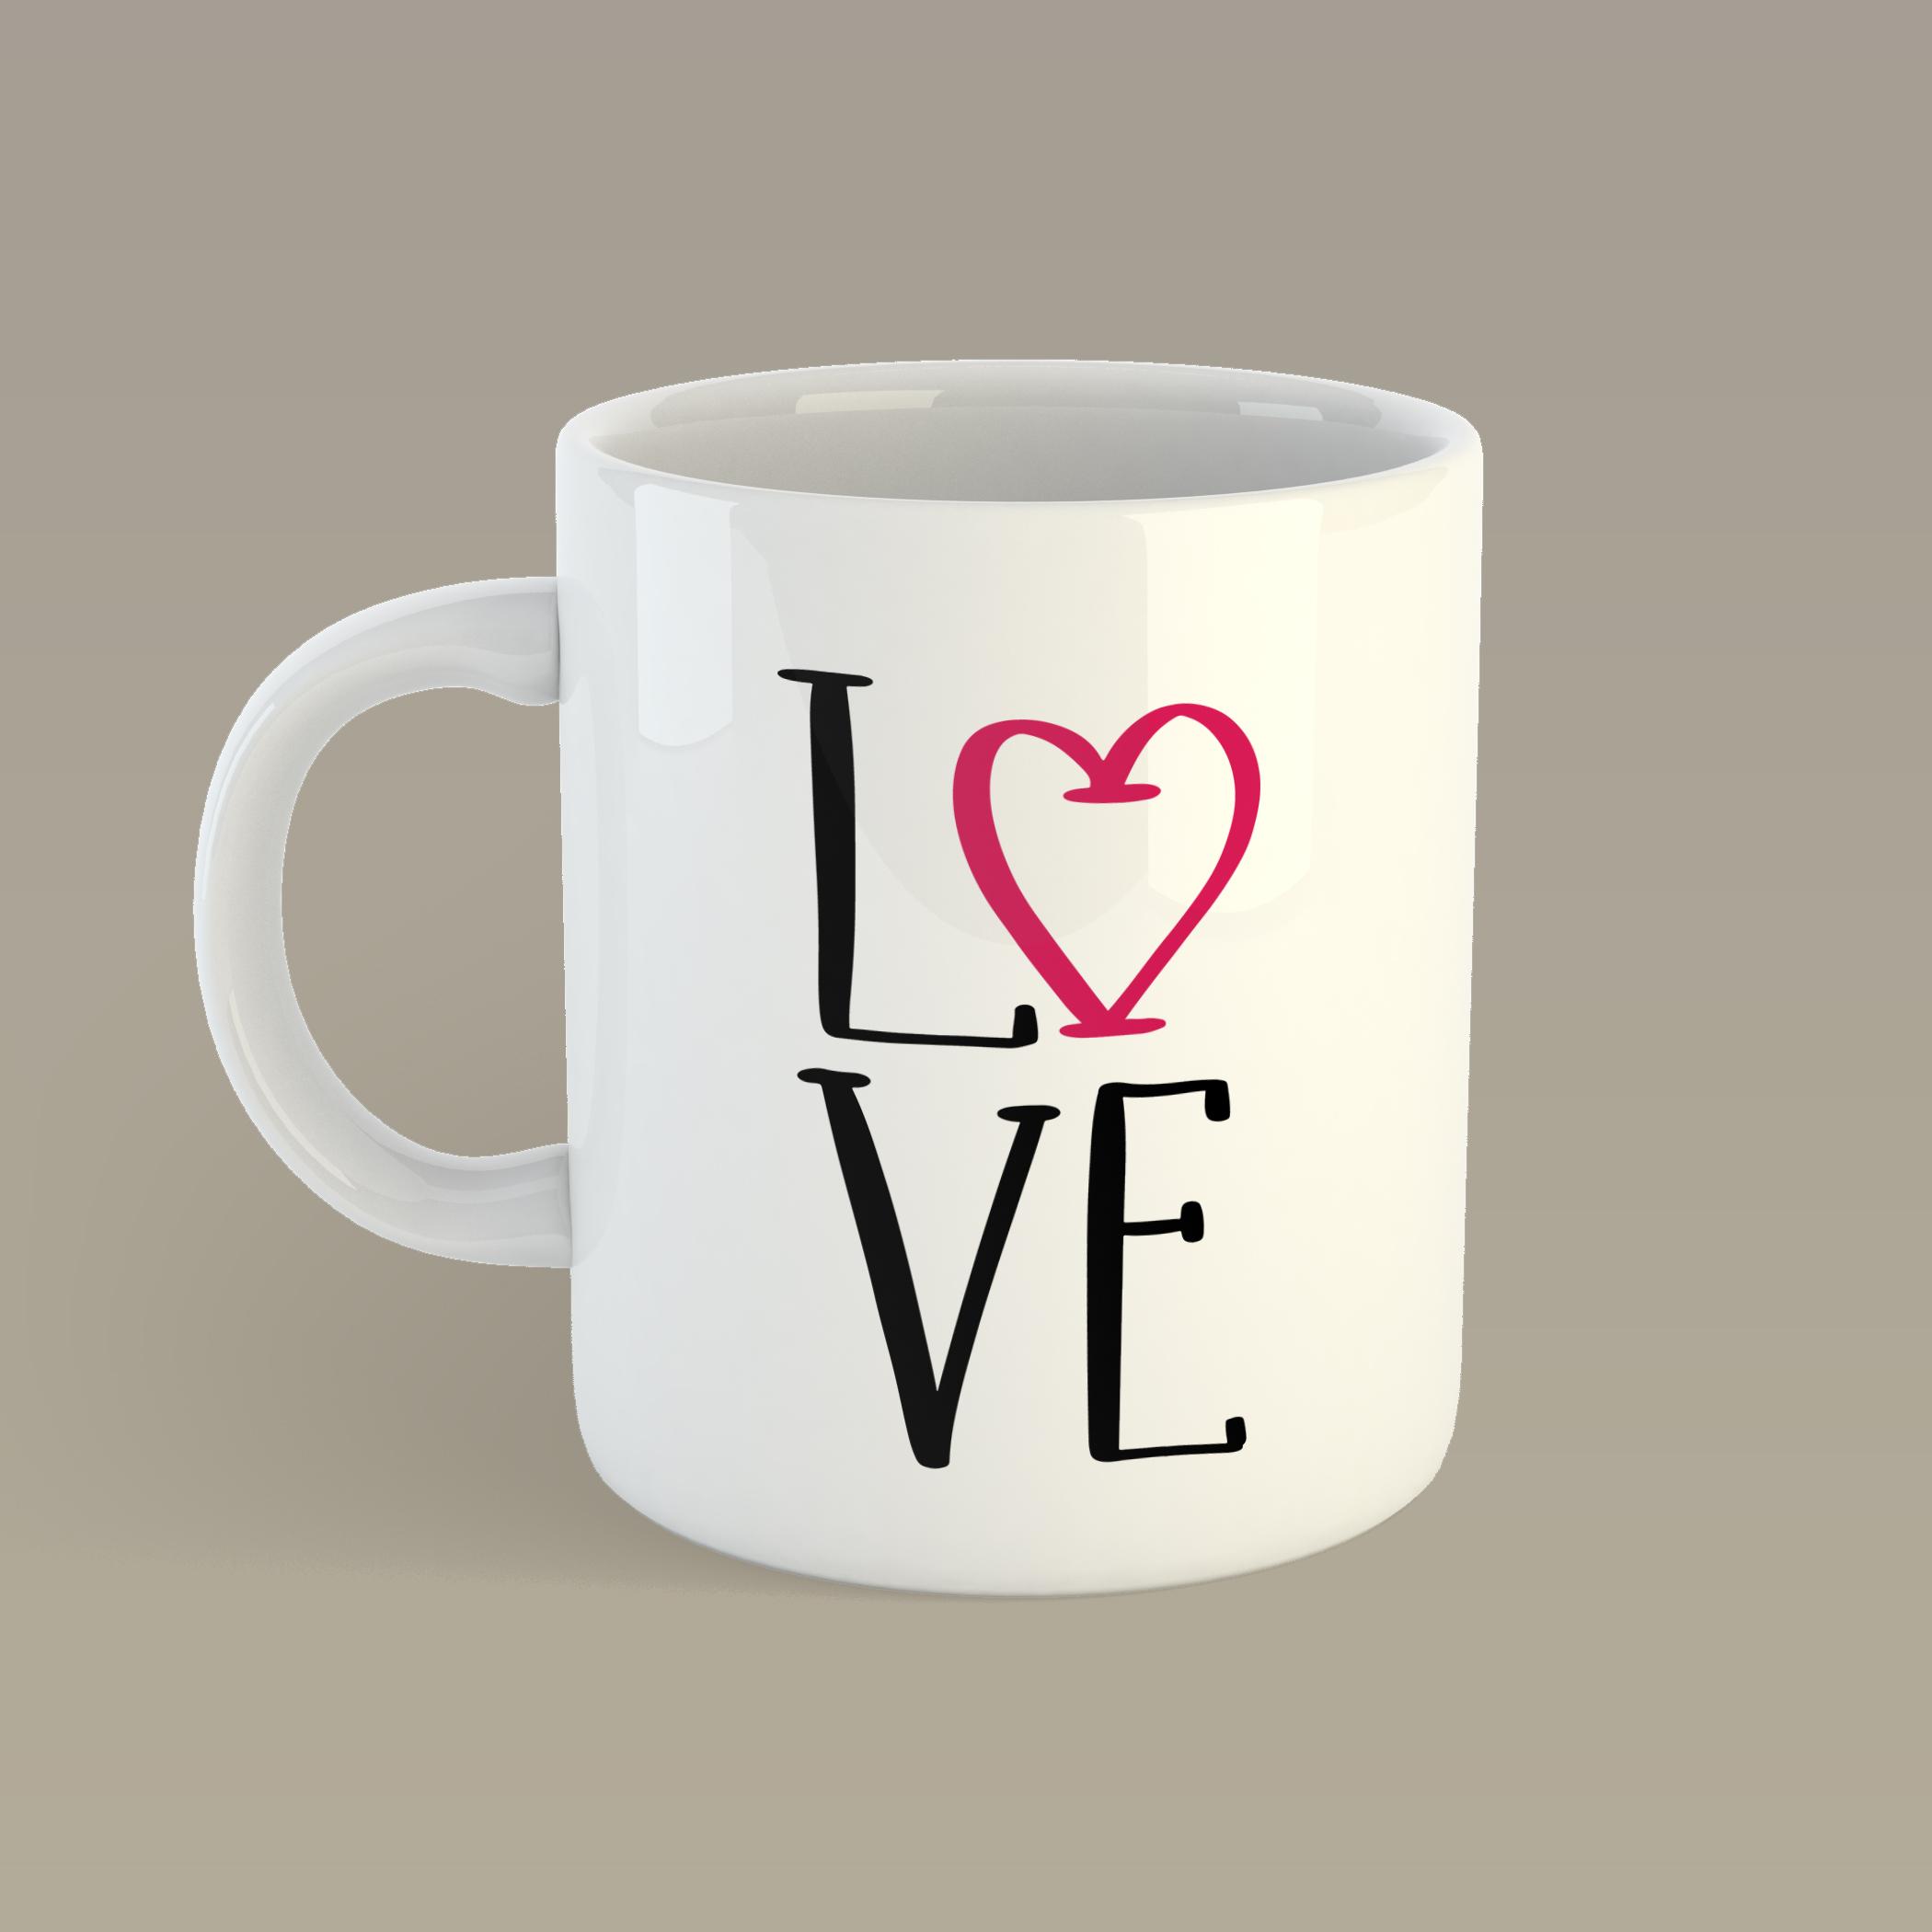 915f833633 Love bögre 01 - T-shirts.hu